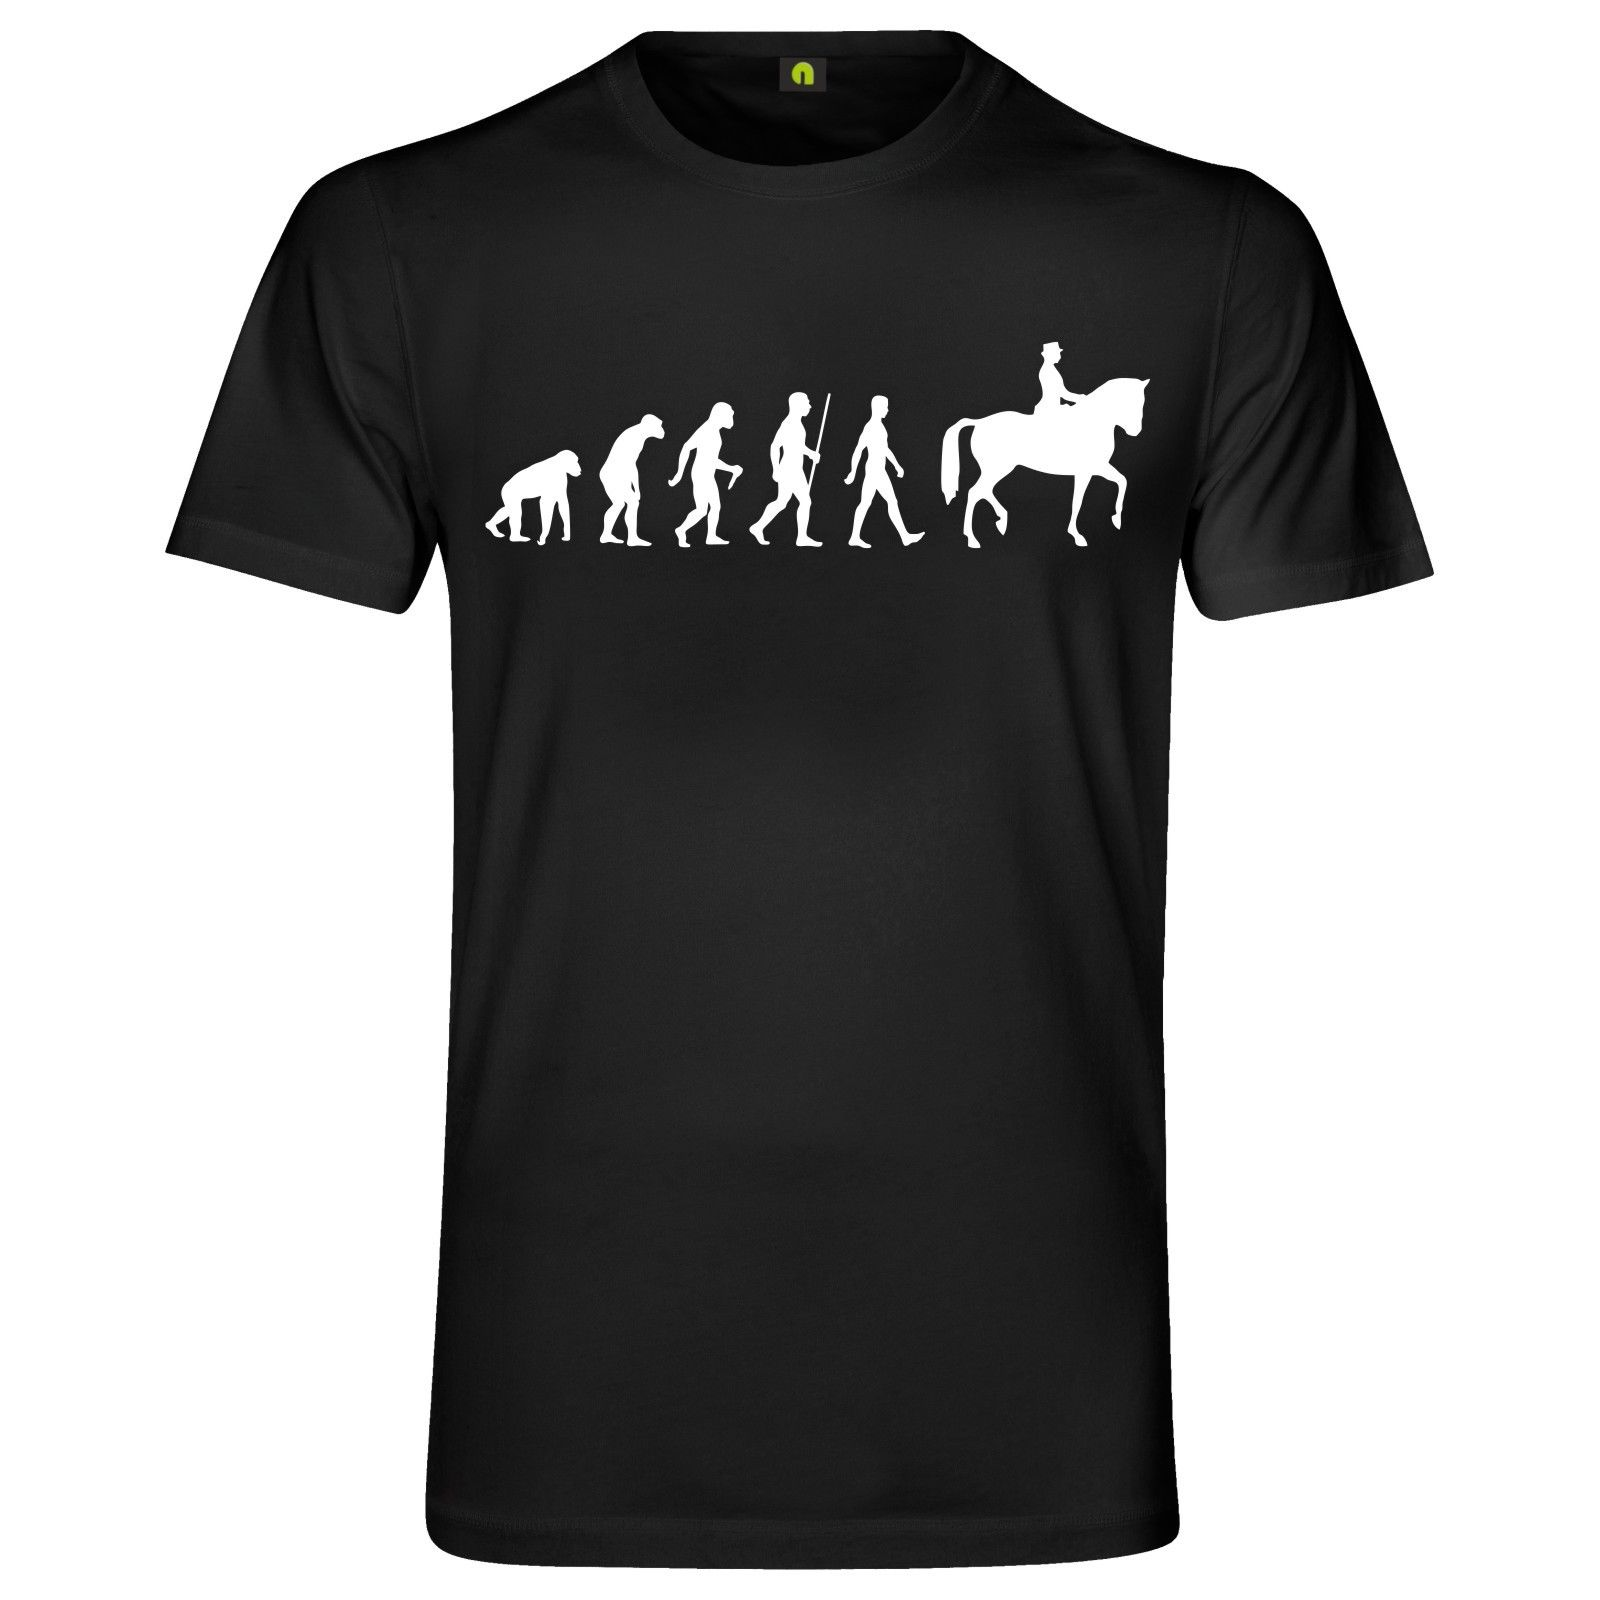 2019 Fashion Cool Men T-shirt Evolution Horse T-Shirt | Pony | STUD | horse| YARD | hutch Tee